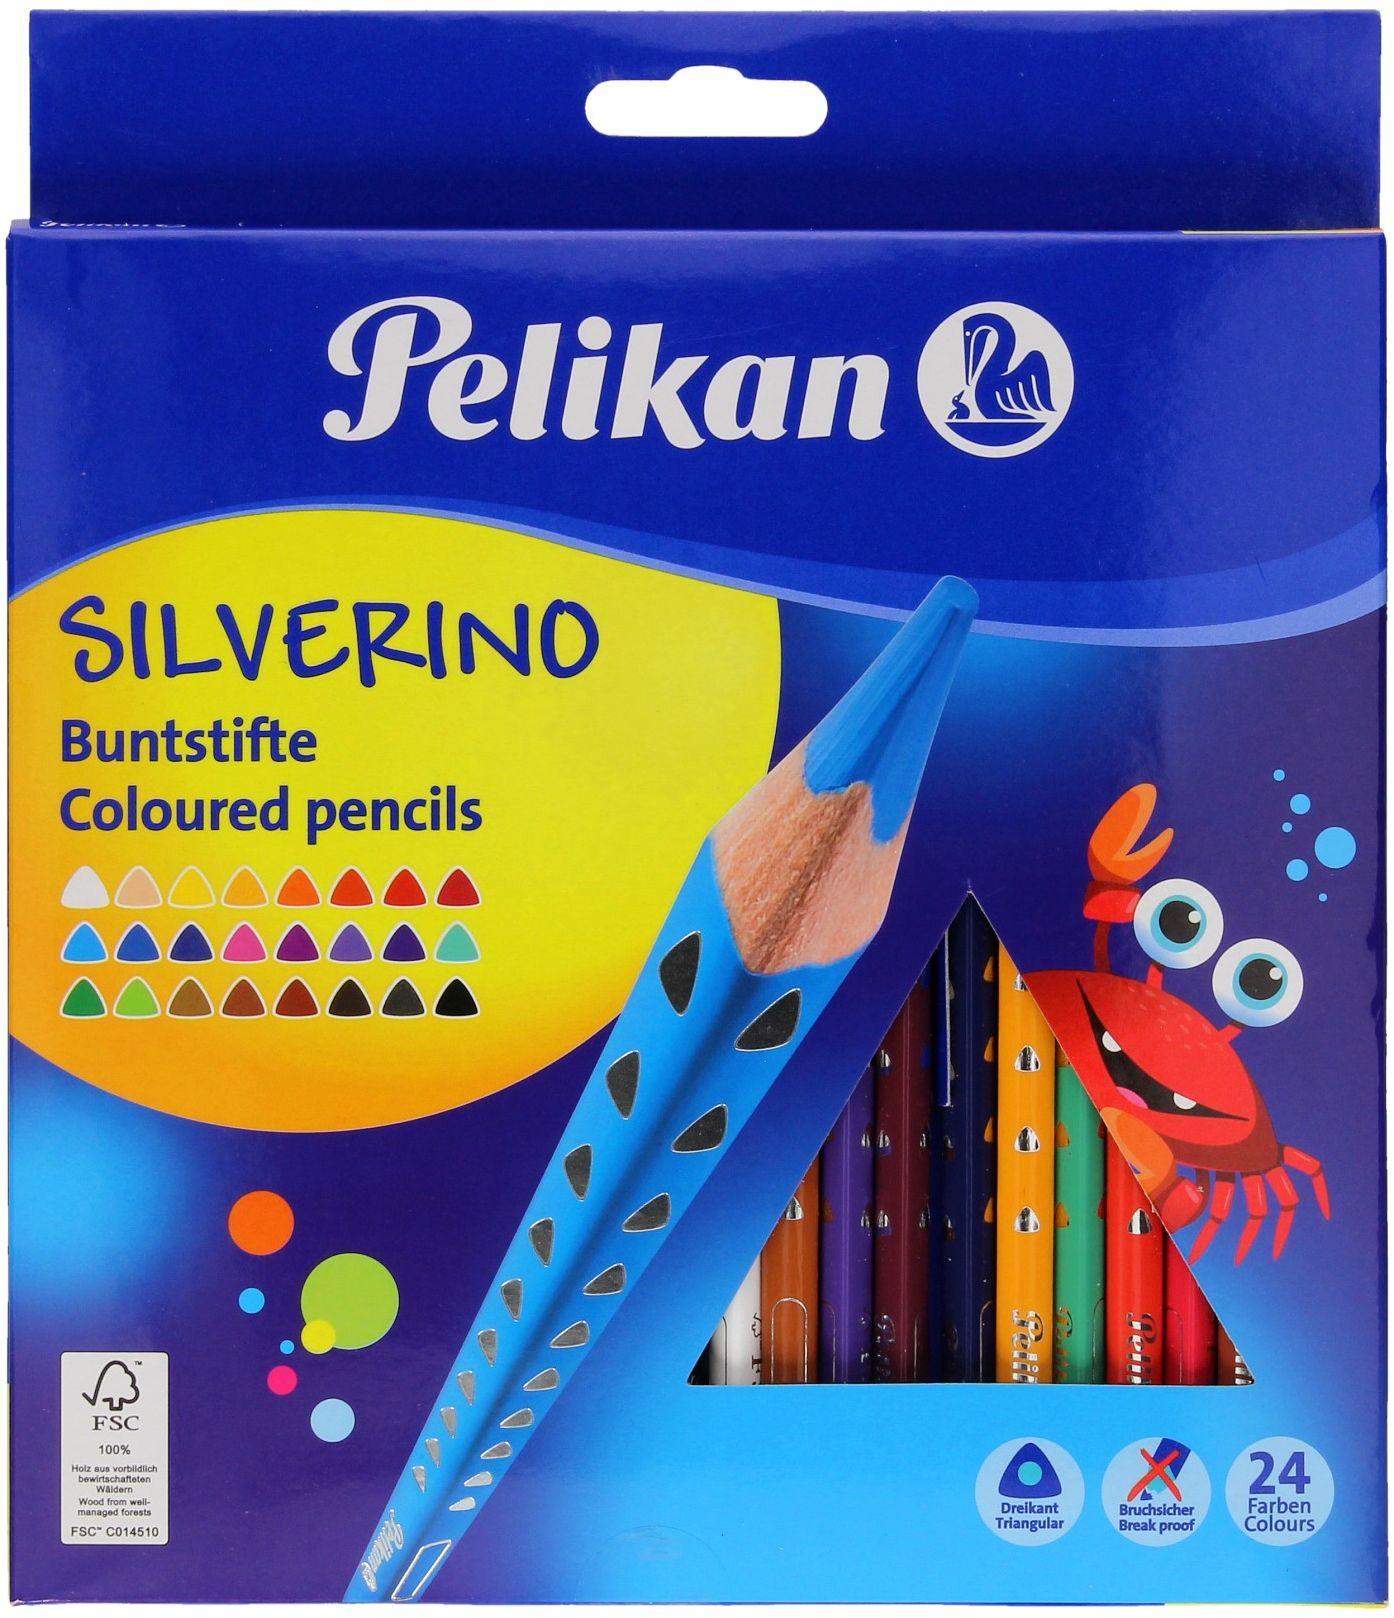 Kredki ołówkowe 24kol trójkątne Silverino Pelikan